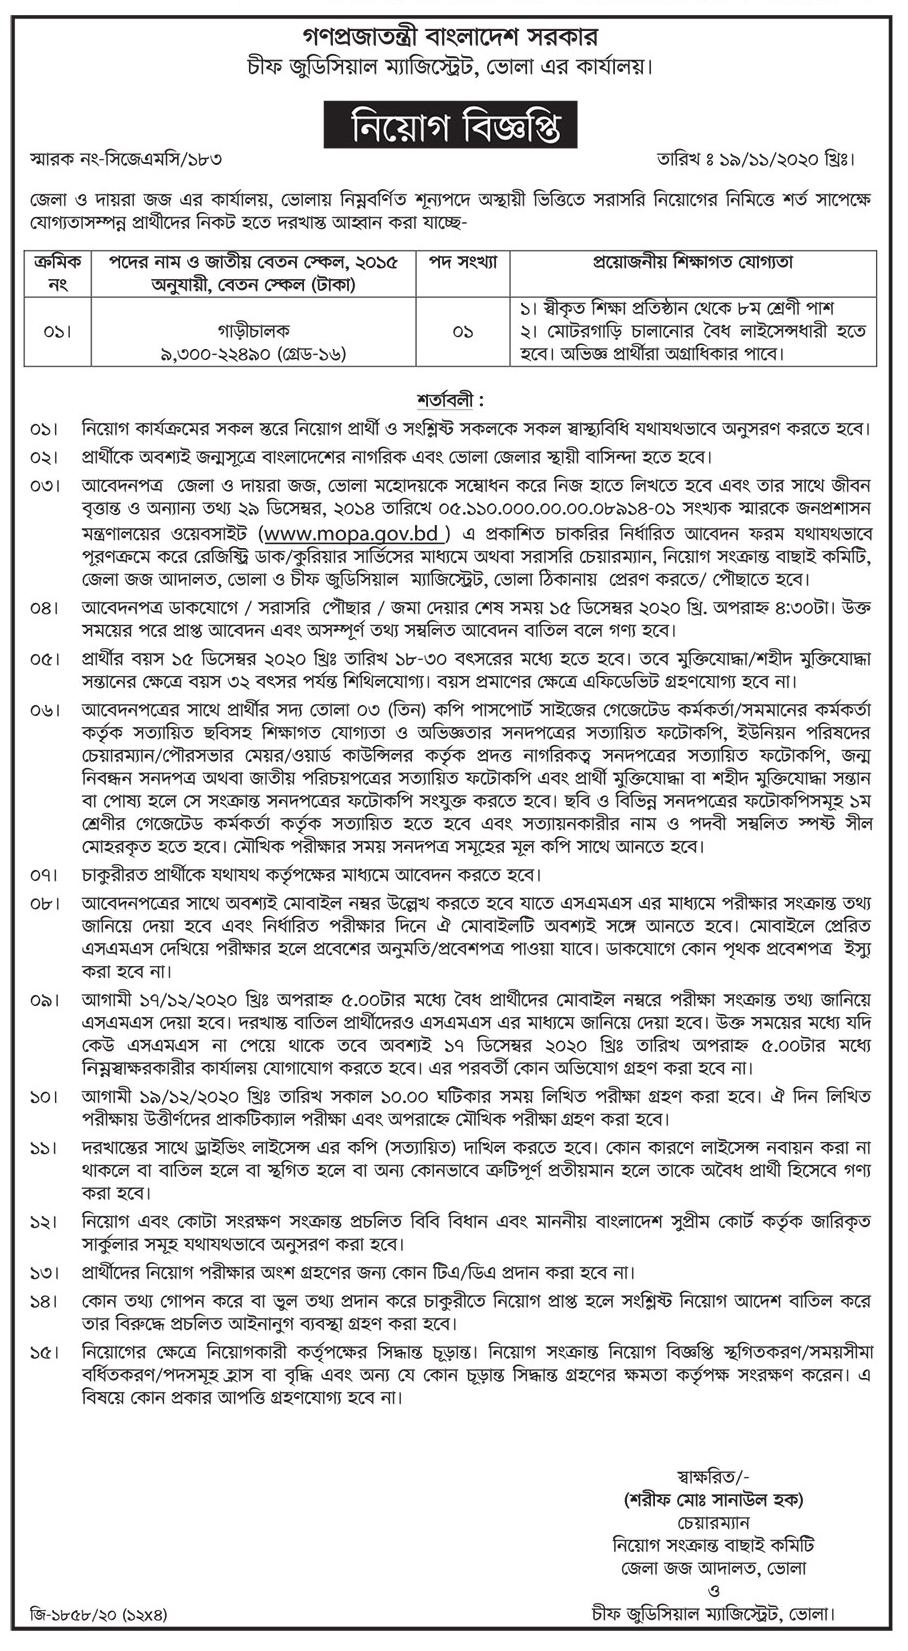 Chief Judicial Magistrate Job Circular 2020